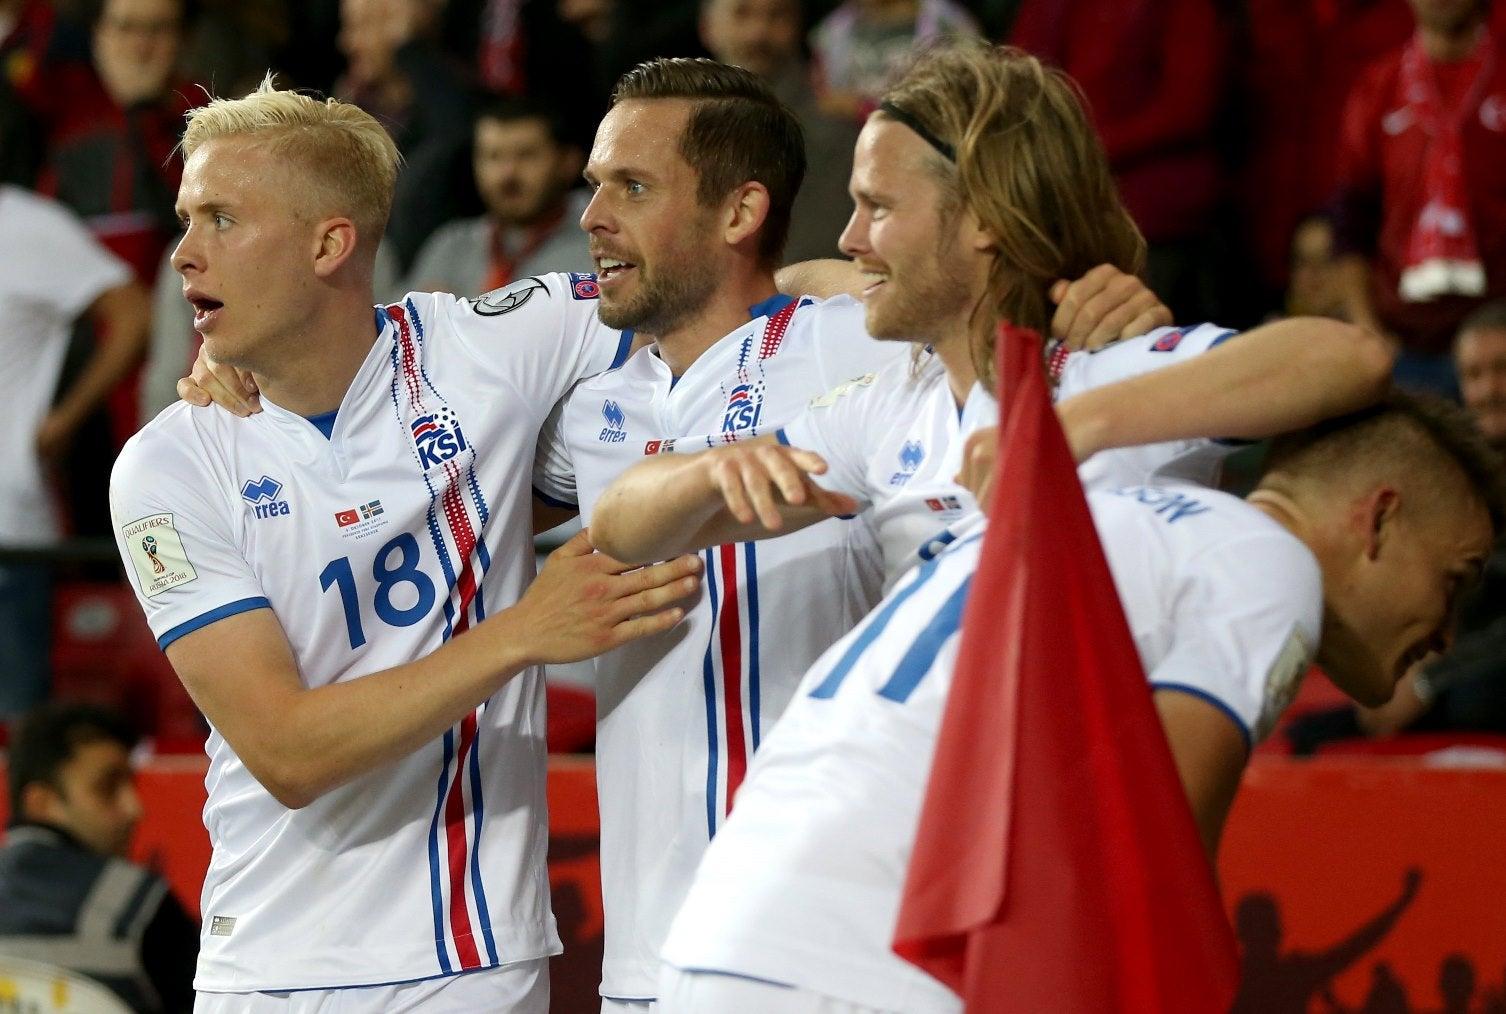 Islândia vence e garante vaga inédita no Mundial